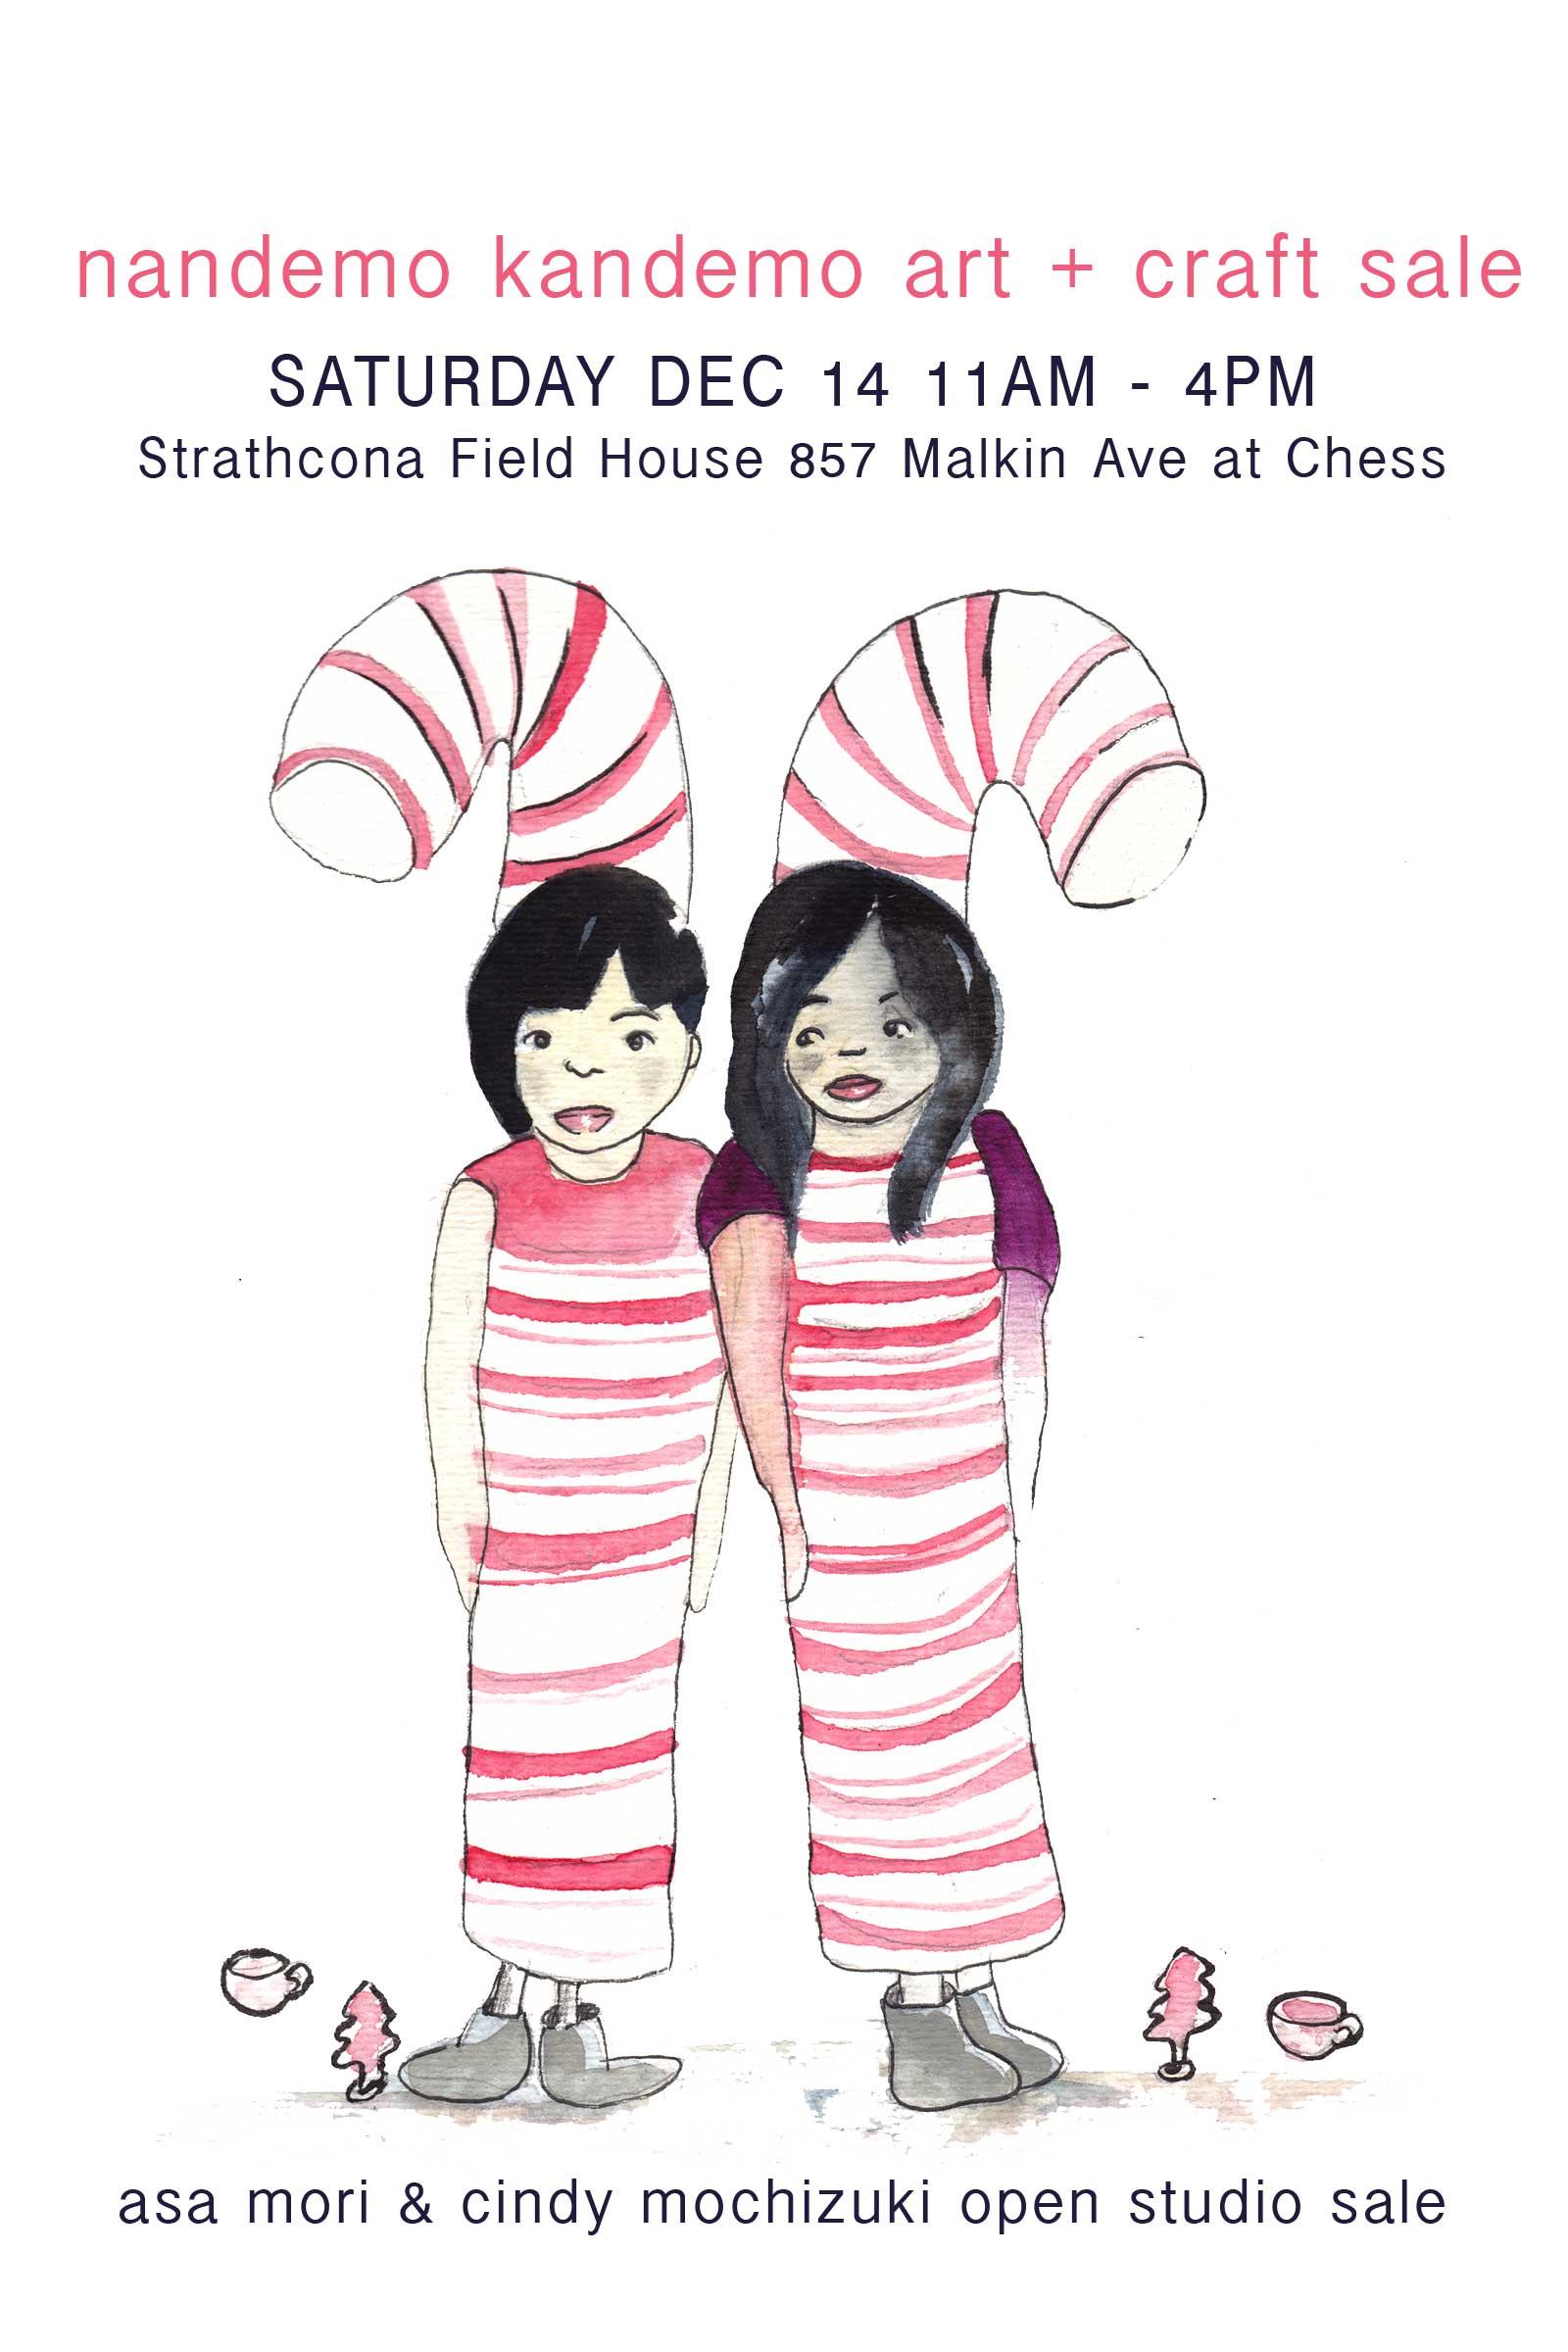 Asa Mori & Cindy Mochizuki studio sale at the Strathcona Field House!